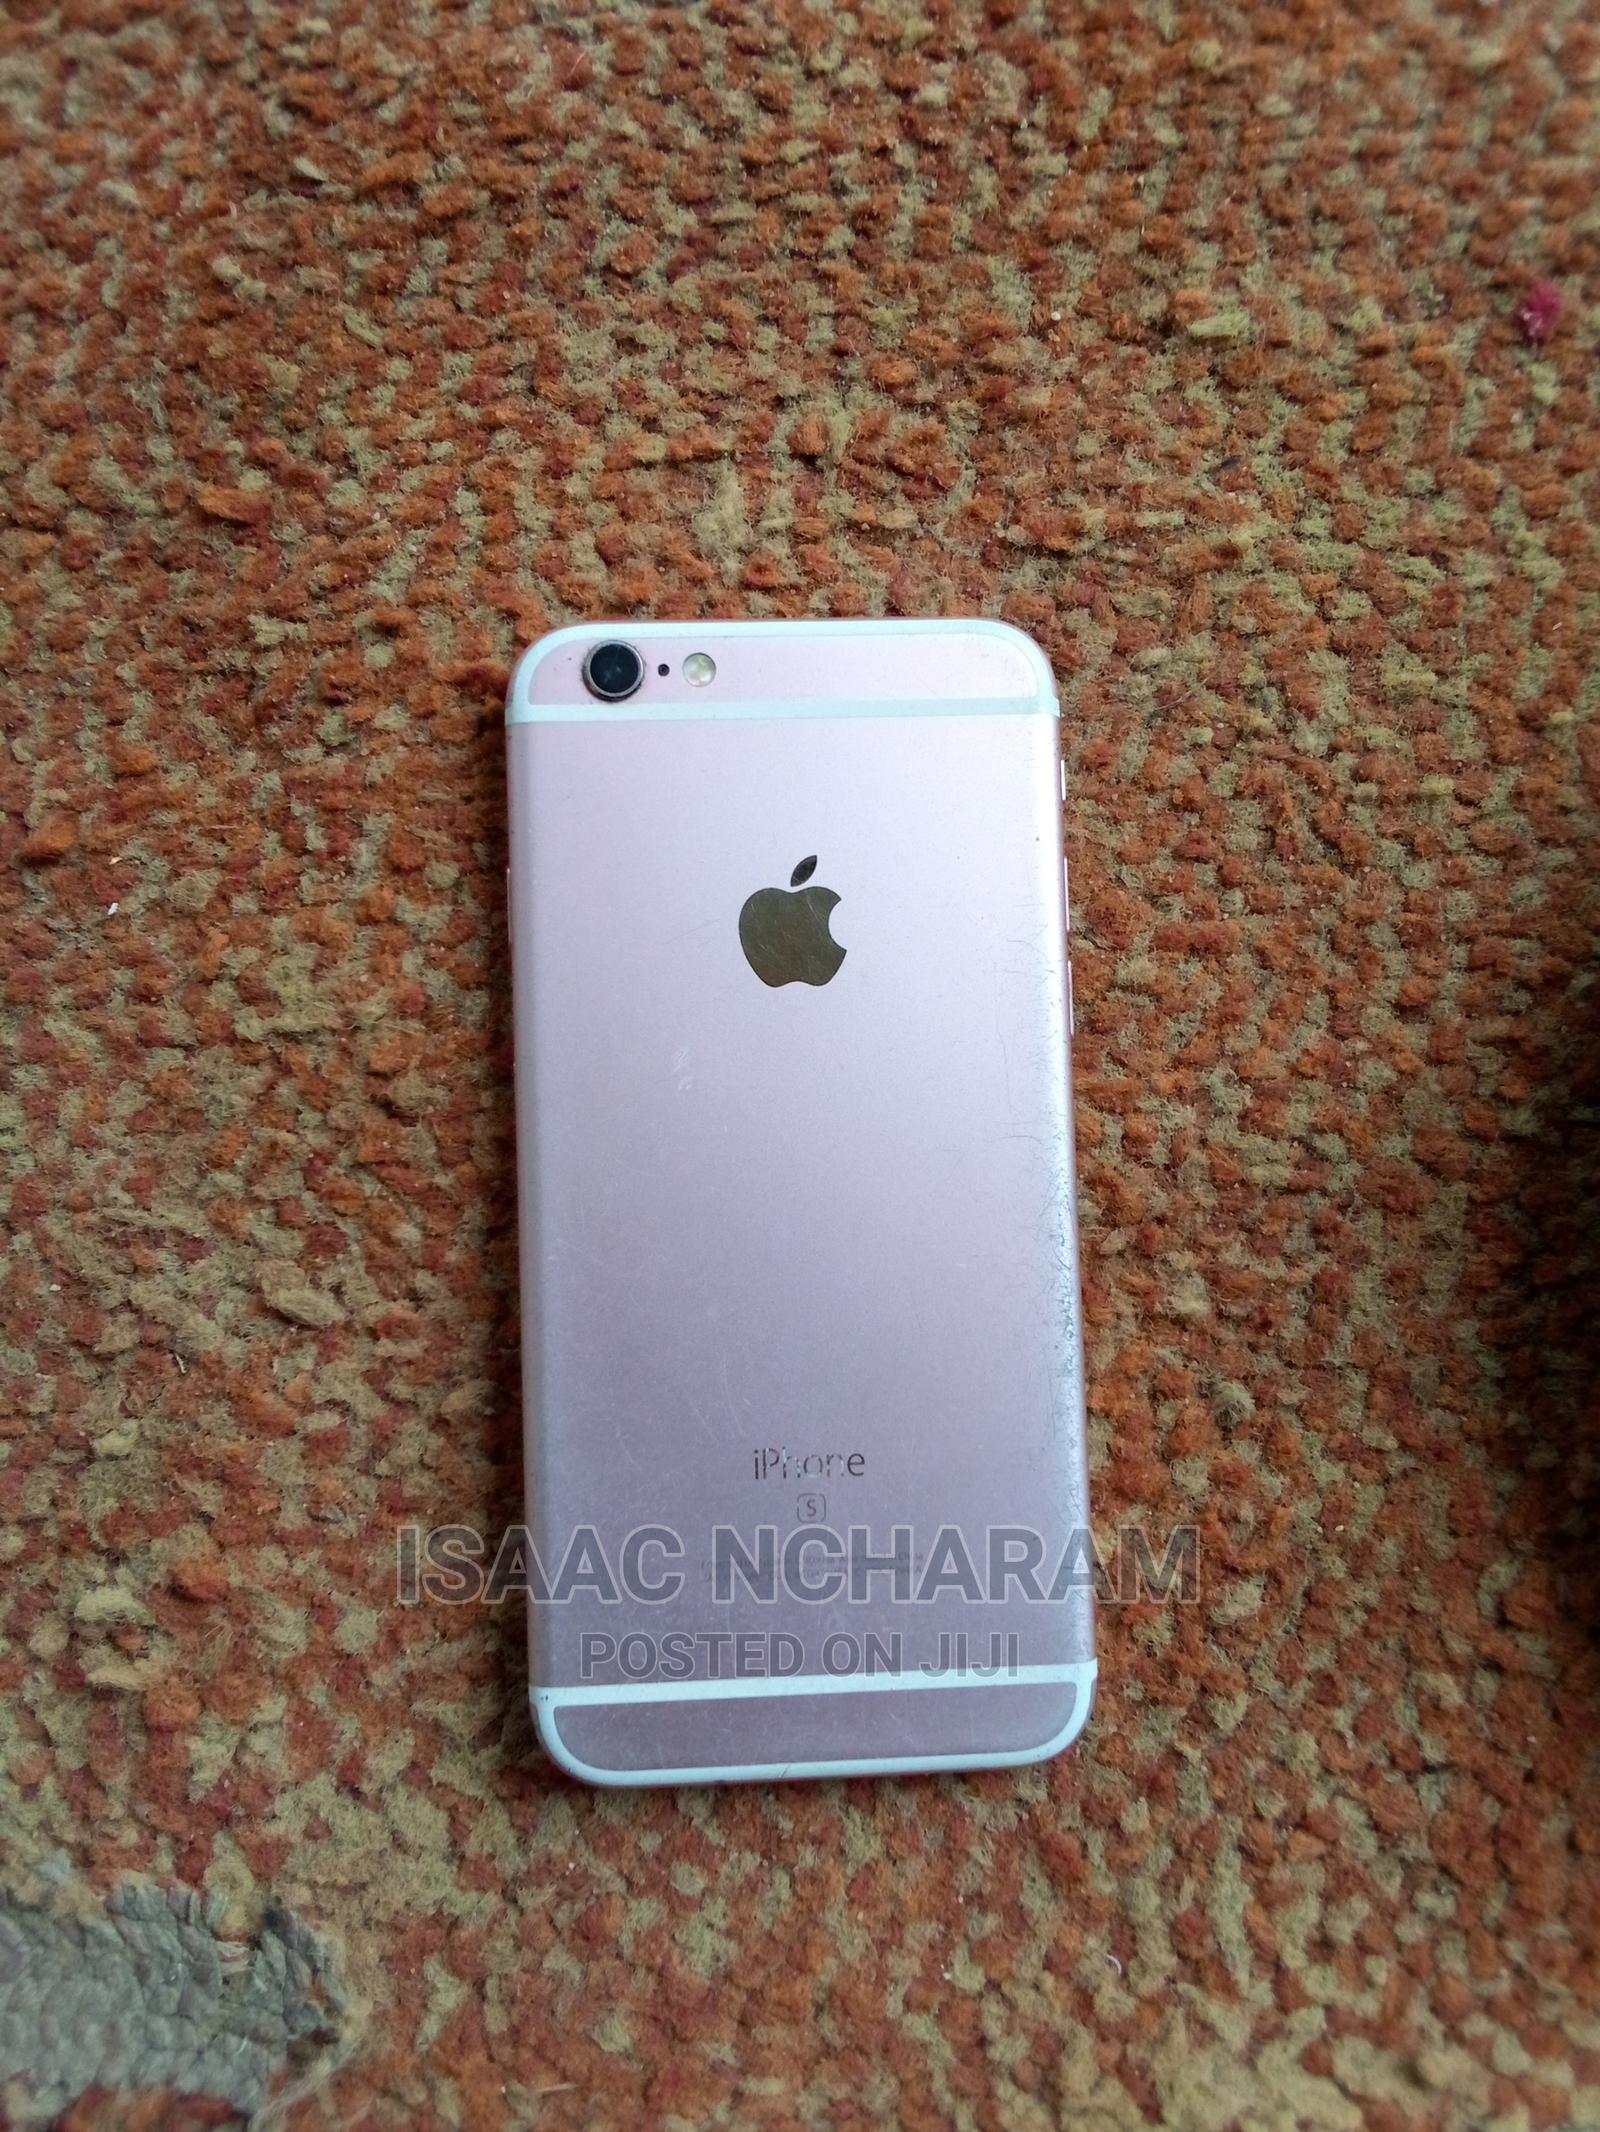 Apple iPhone 6s 16 GB Silver | Mobile Phones for sale in Uyo, Akwa Ibom State, Nigeria